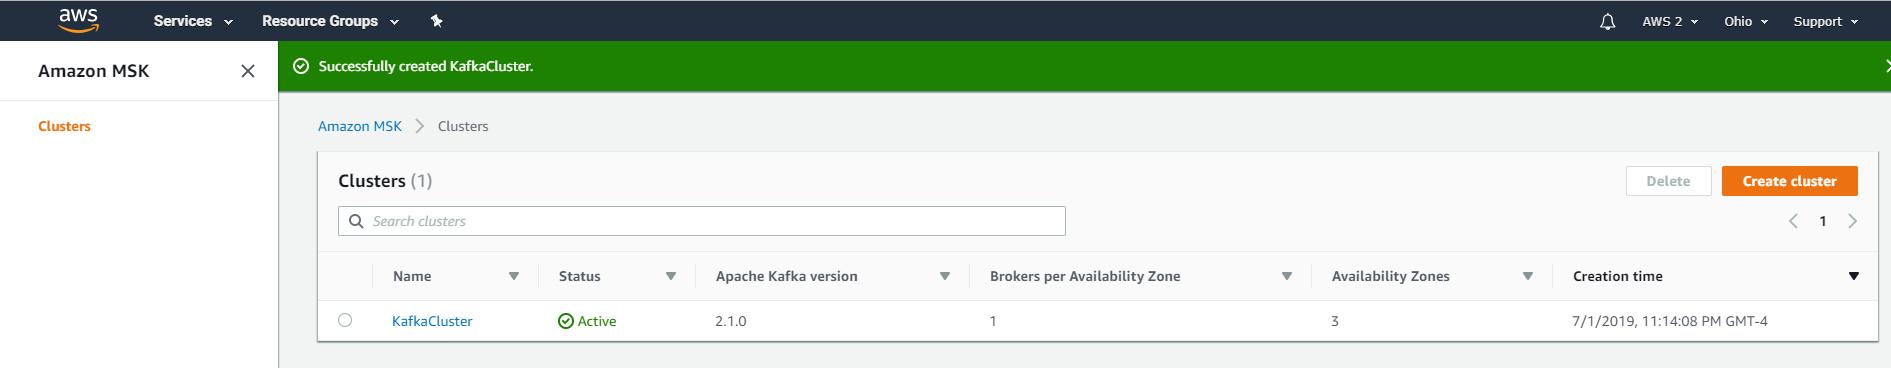 Data Streaming with Kafka (AWS MSK) - Part 2 - Malum Big Data